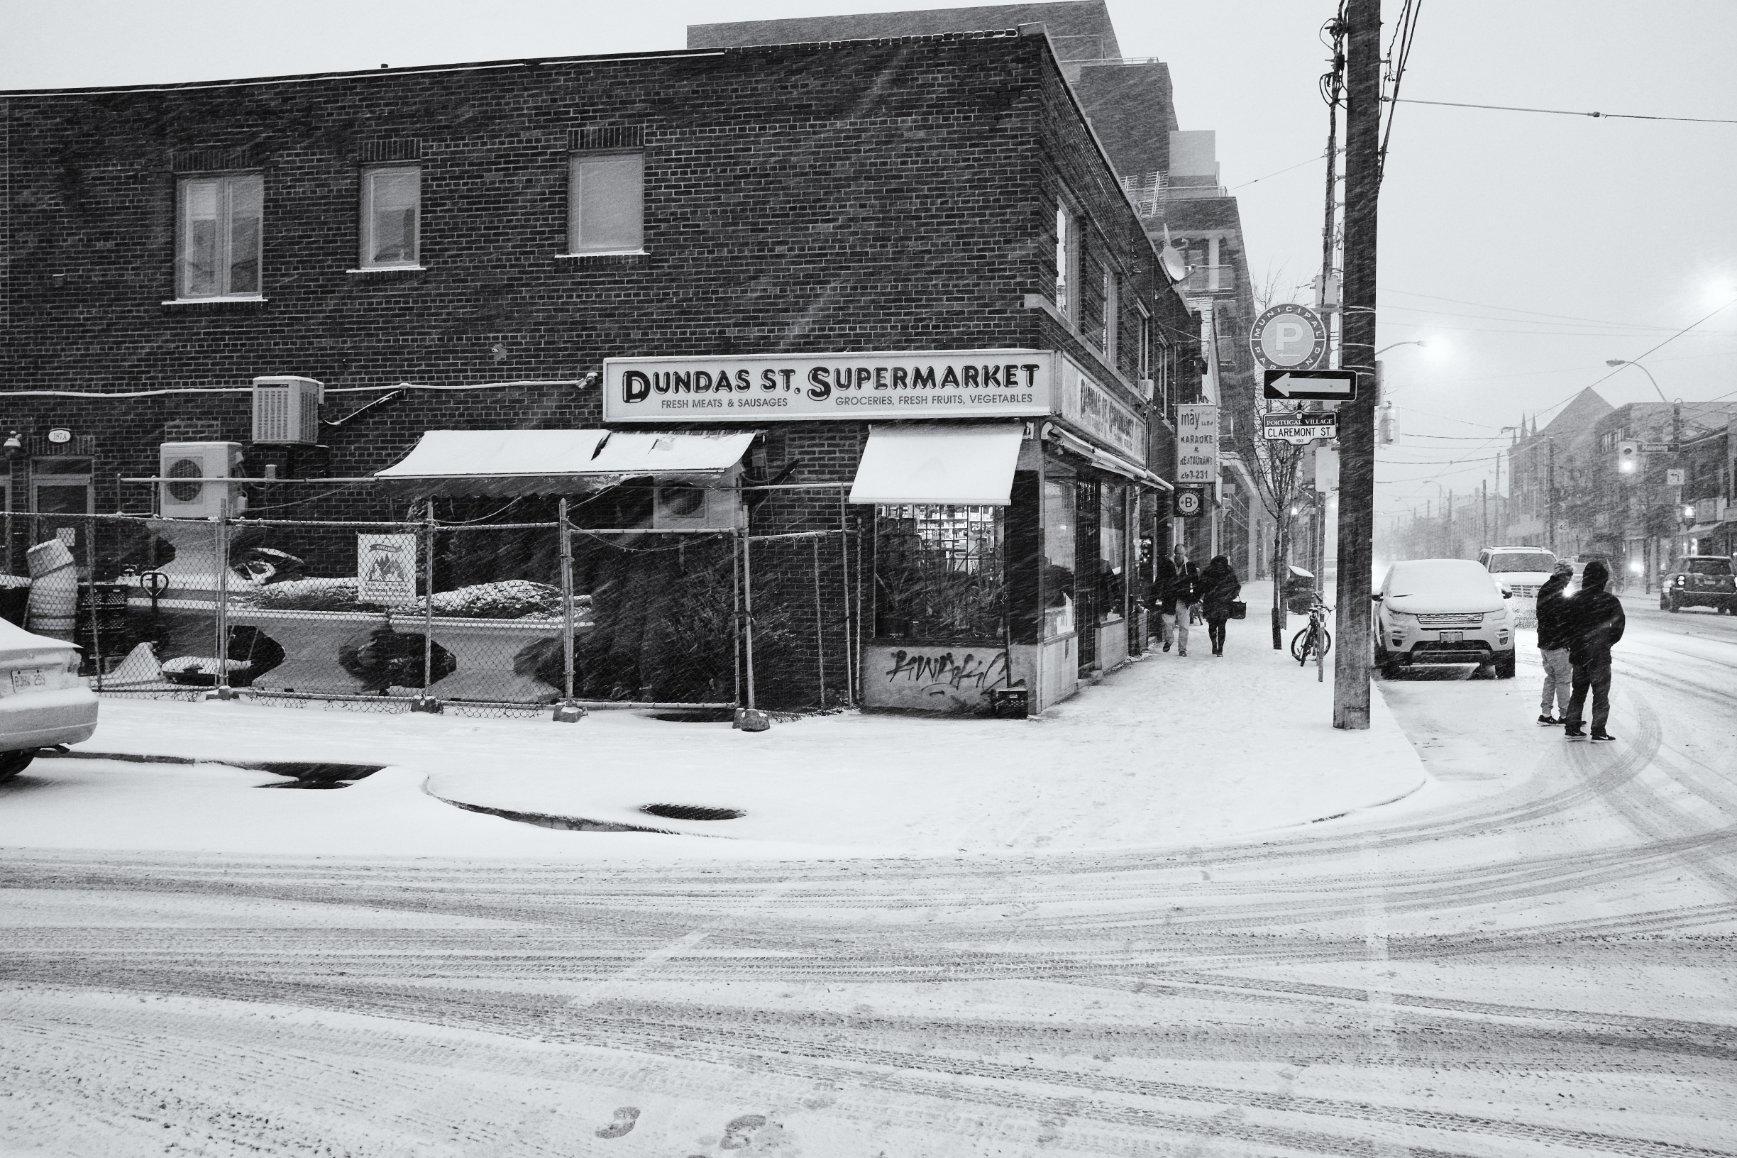 Dundas Street Supermarket by aCreature